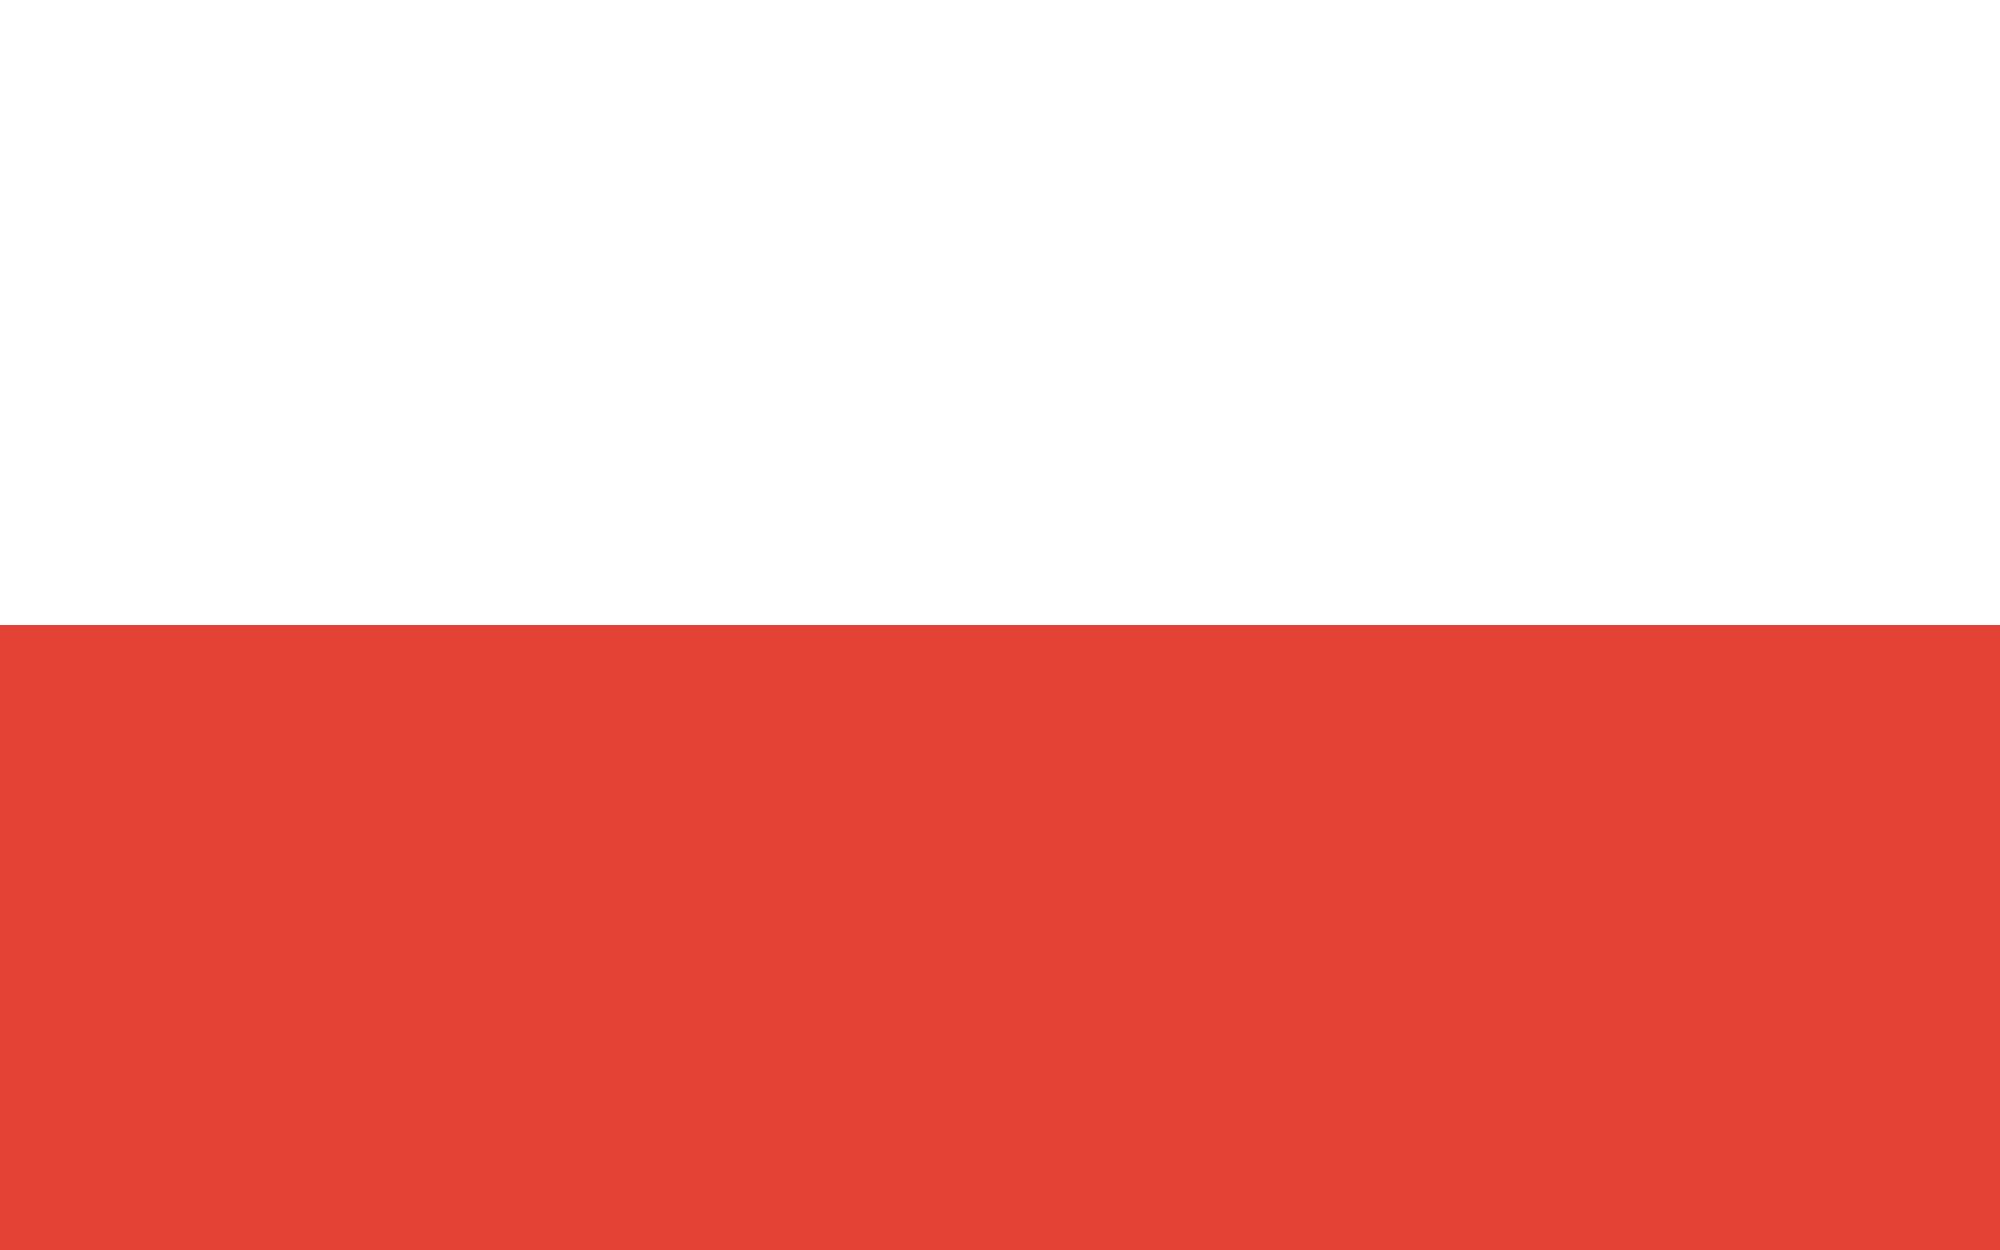 flag_of_poland_1928-1980_svg